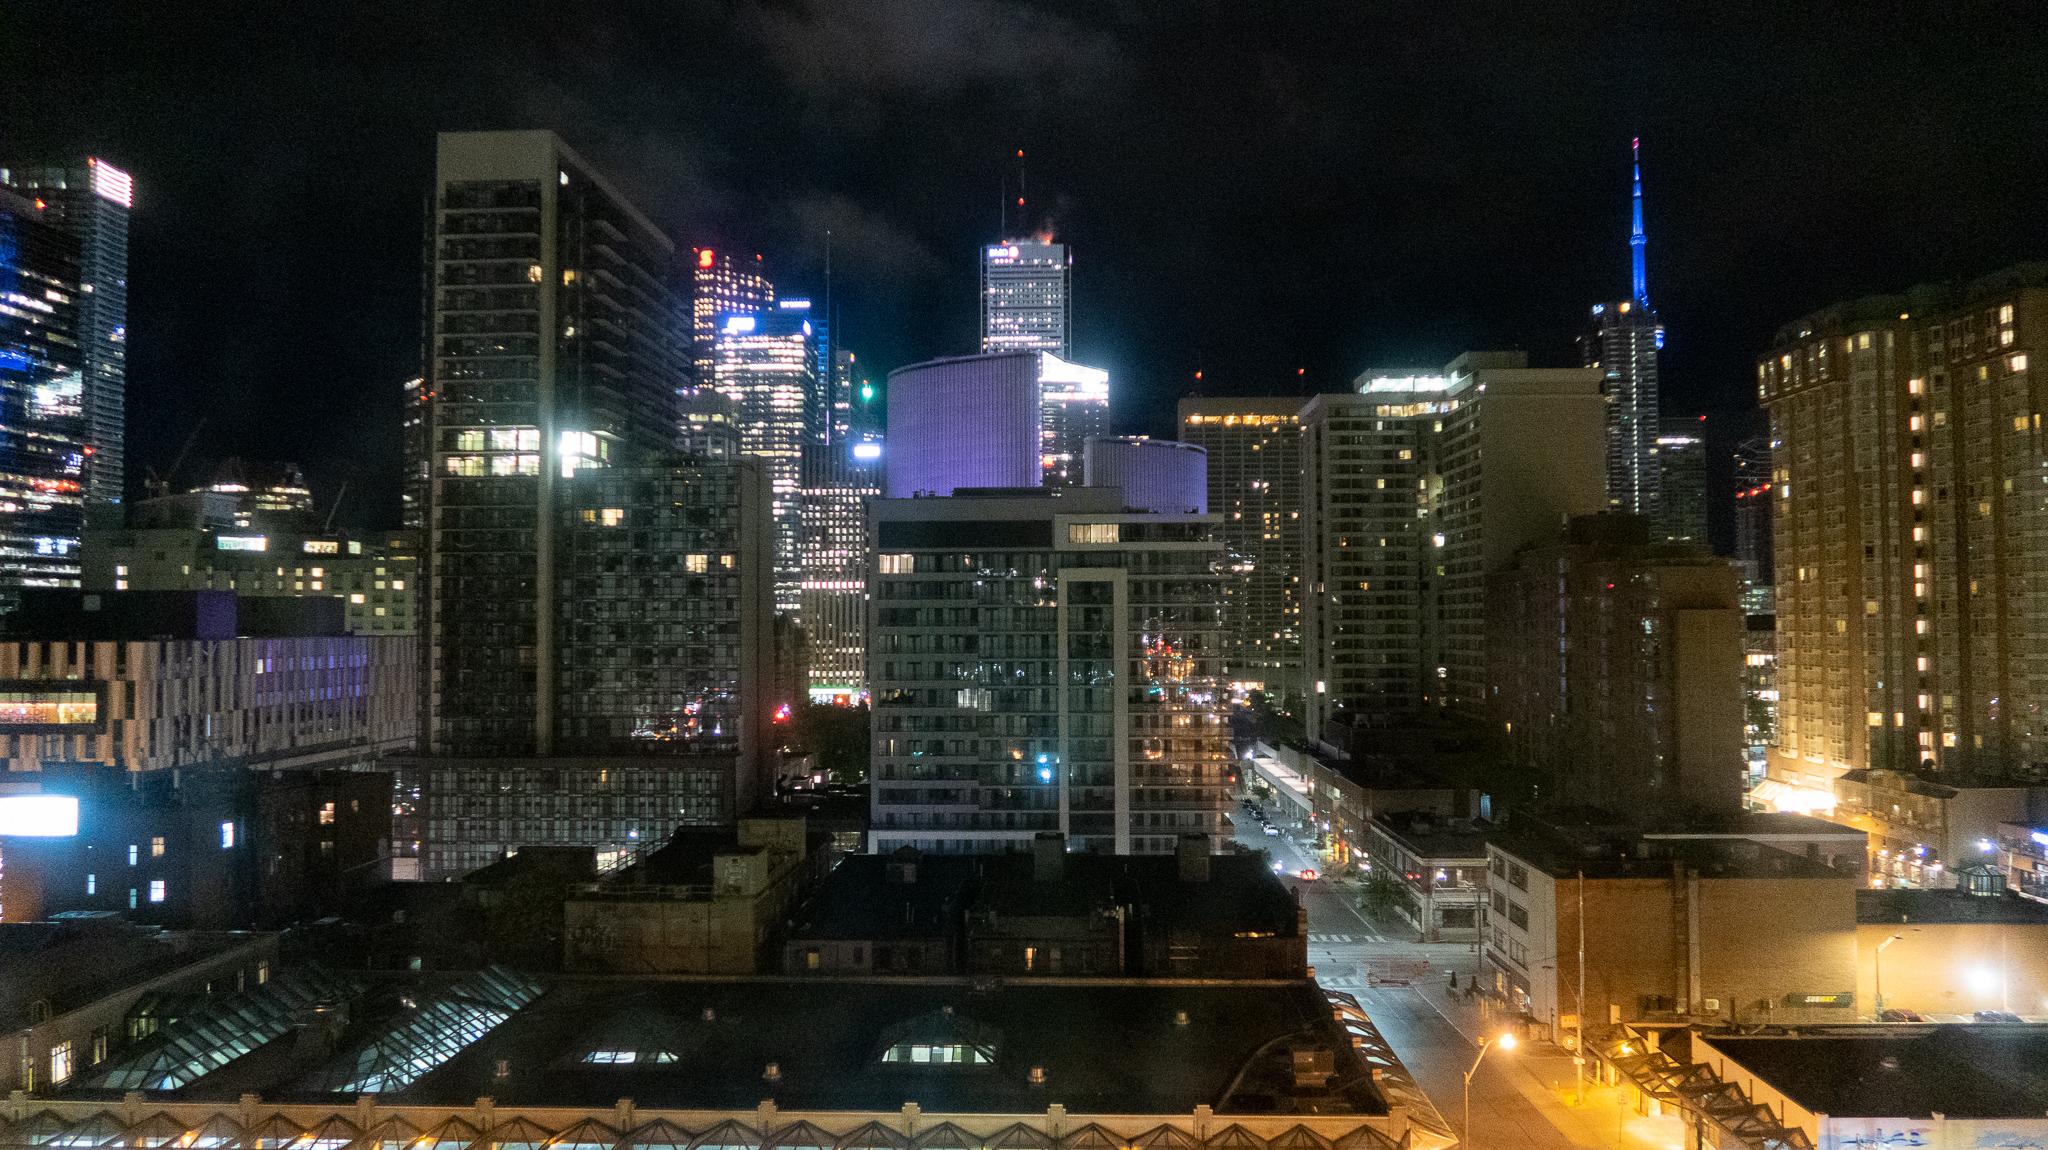 Toronto night scene